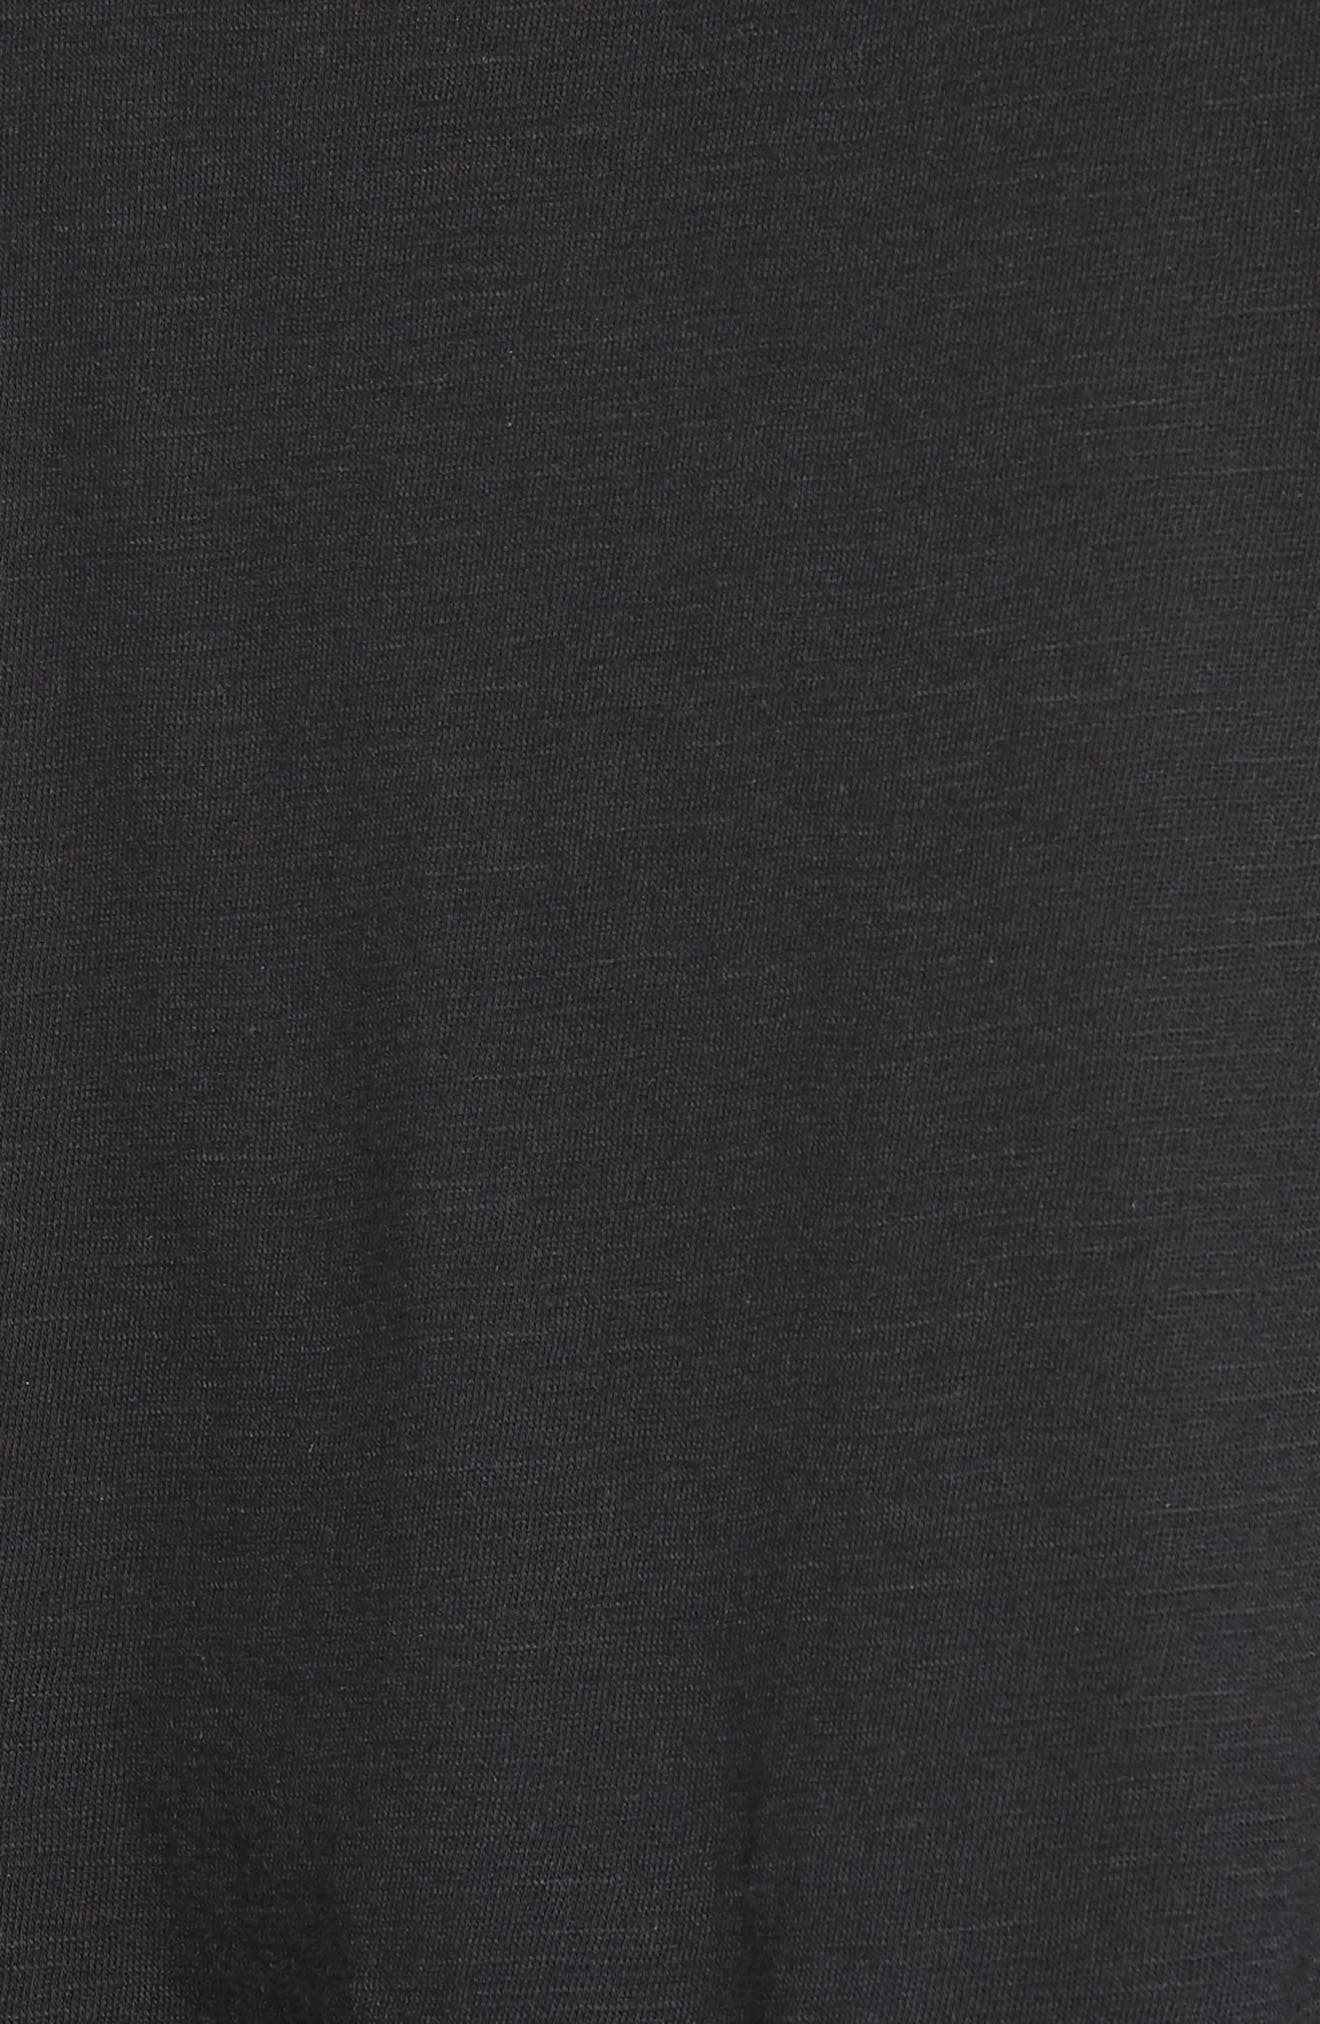 Sleeveless Tulle Trim Tank Top,                             Alternate thumbnail 6, color,                             BLACK